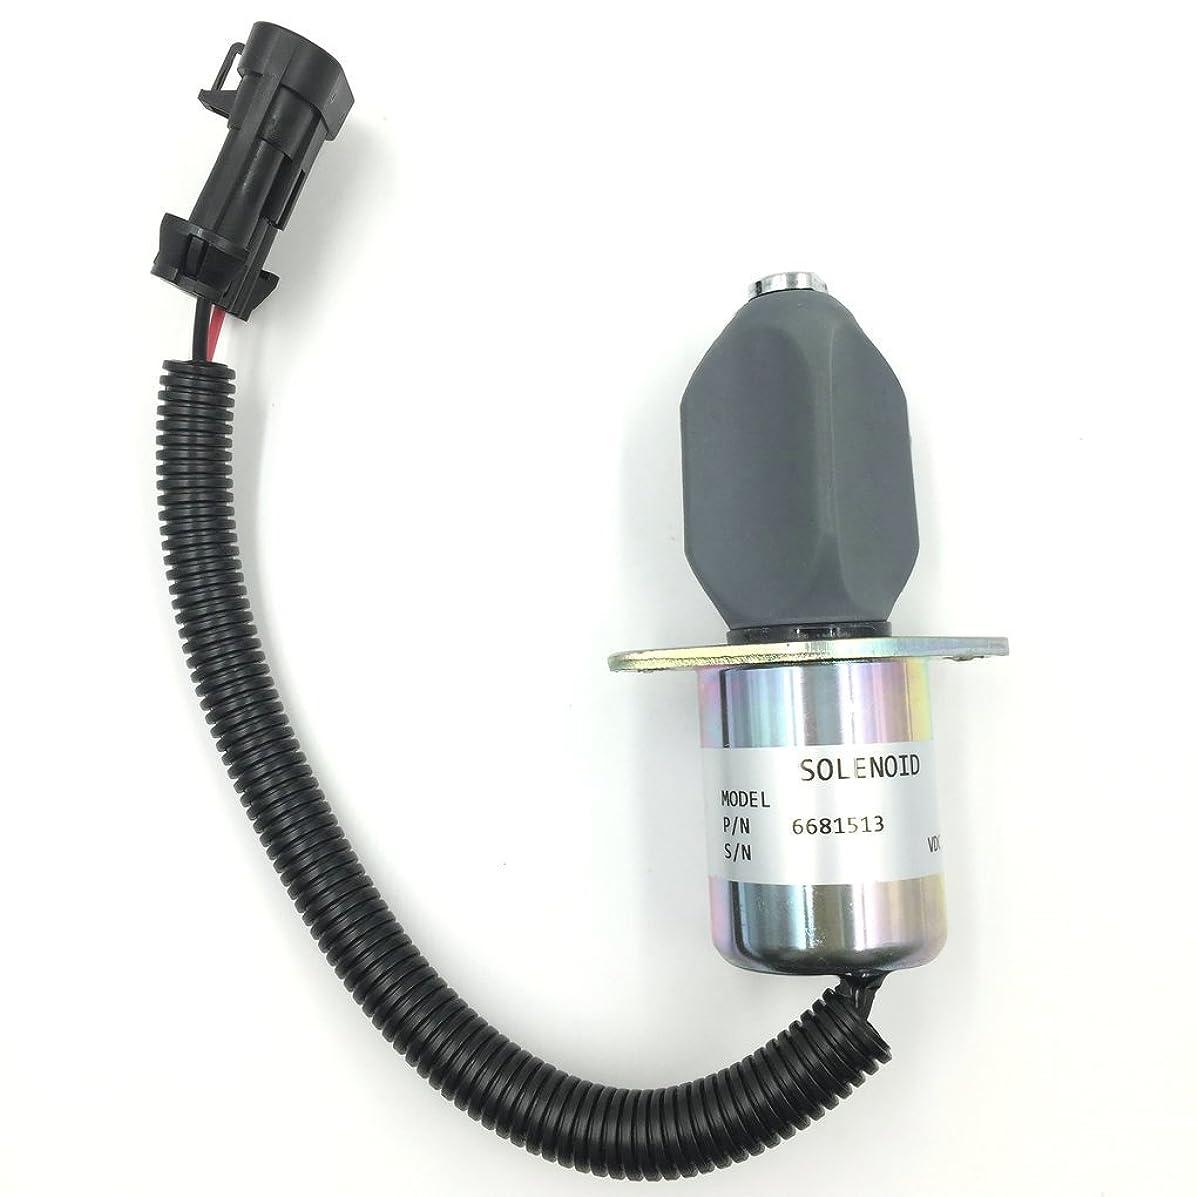 Fuel Shut Off Solenoid 6681513 for Kubota Bobcat Skid Steer S150 S160 S175 S185 T190 751